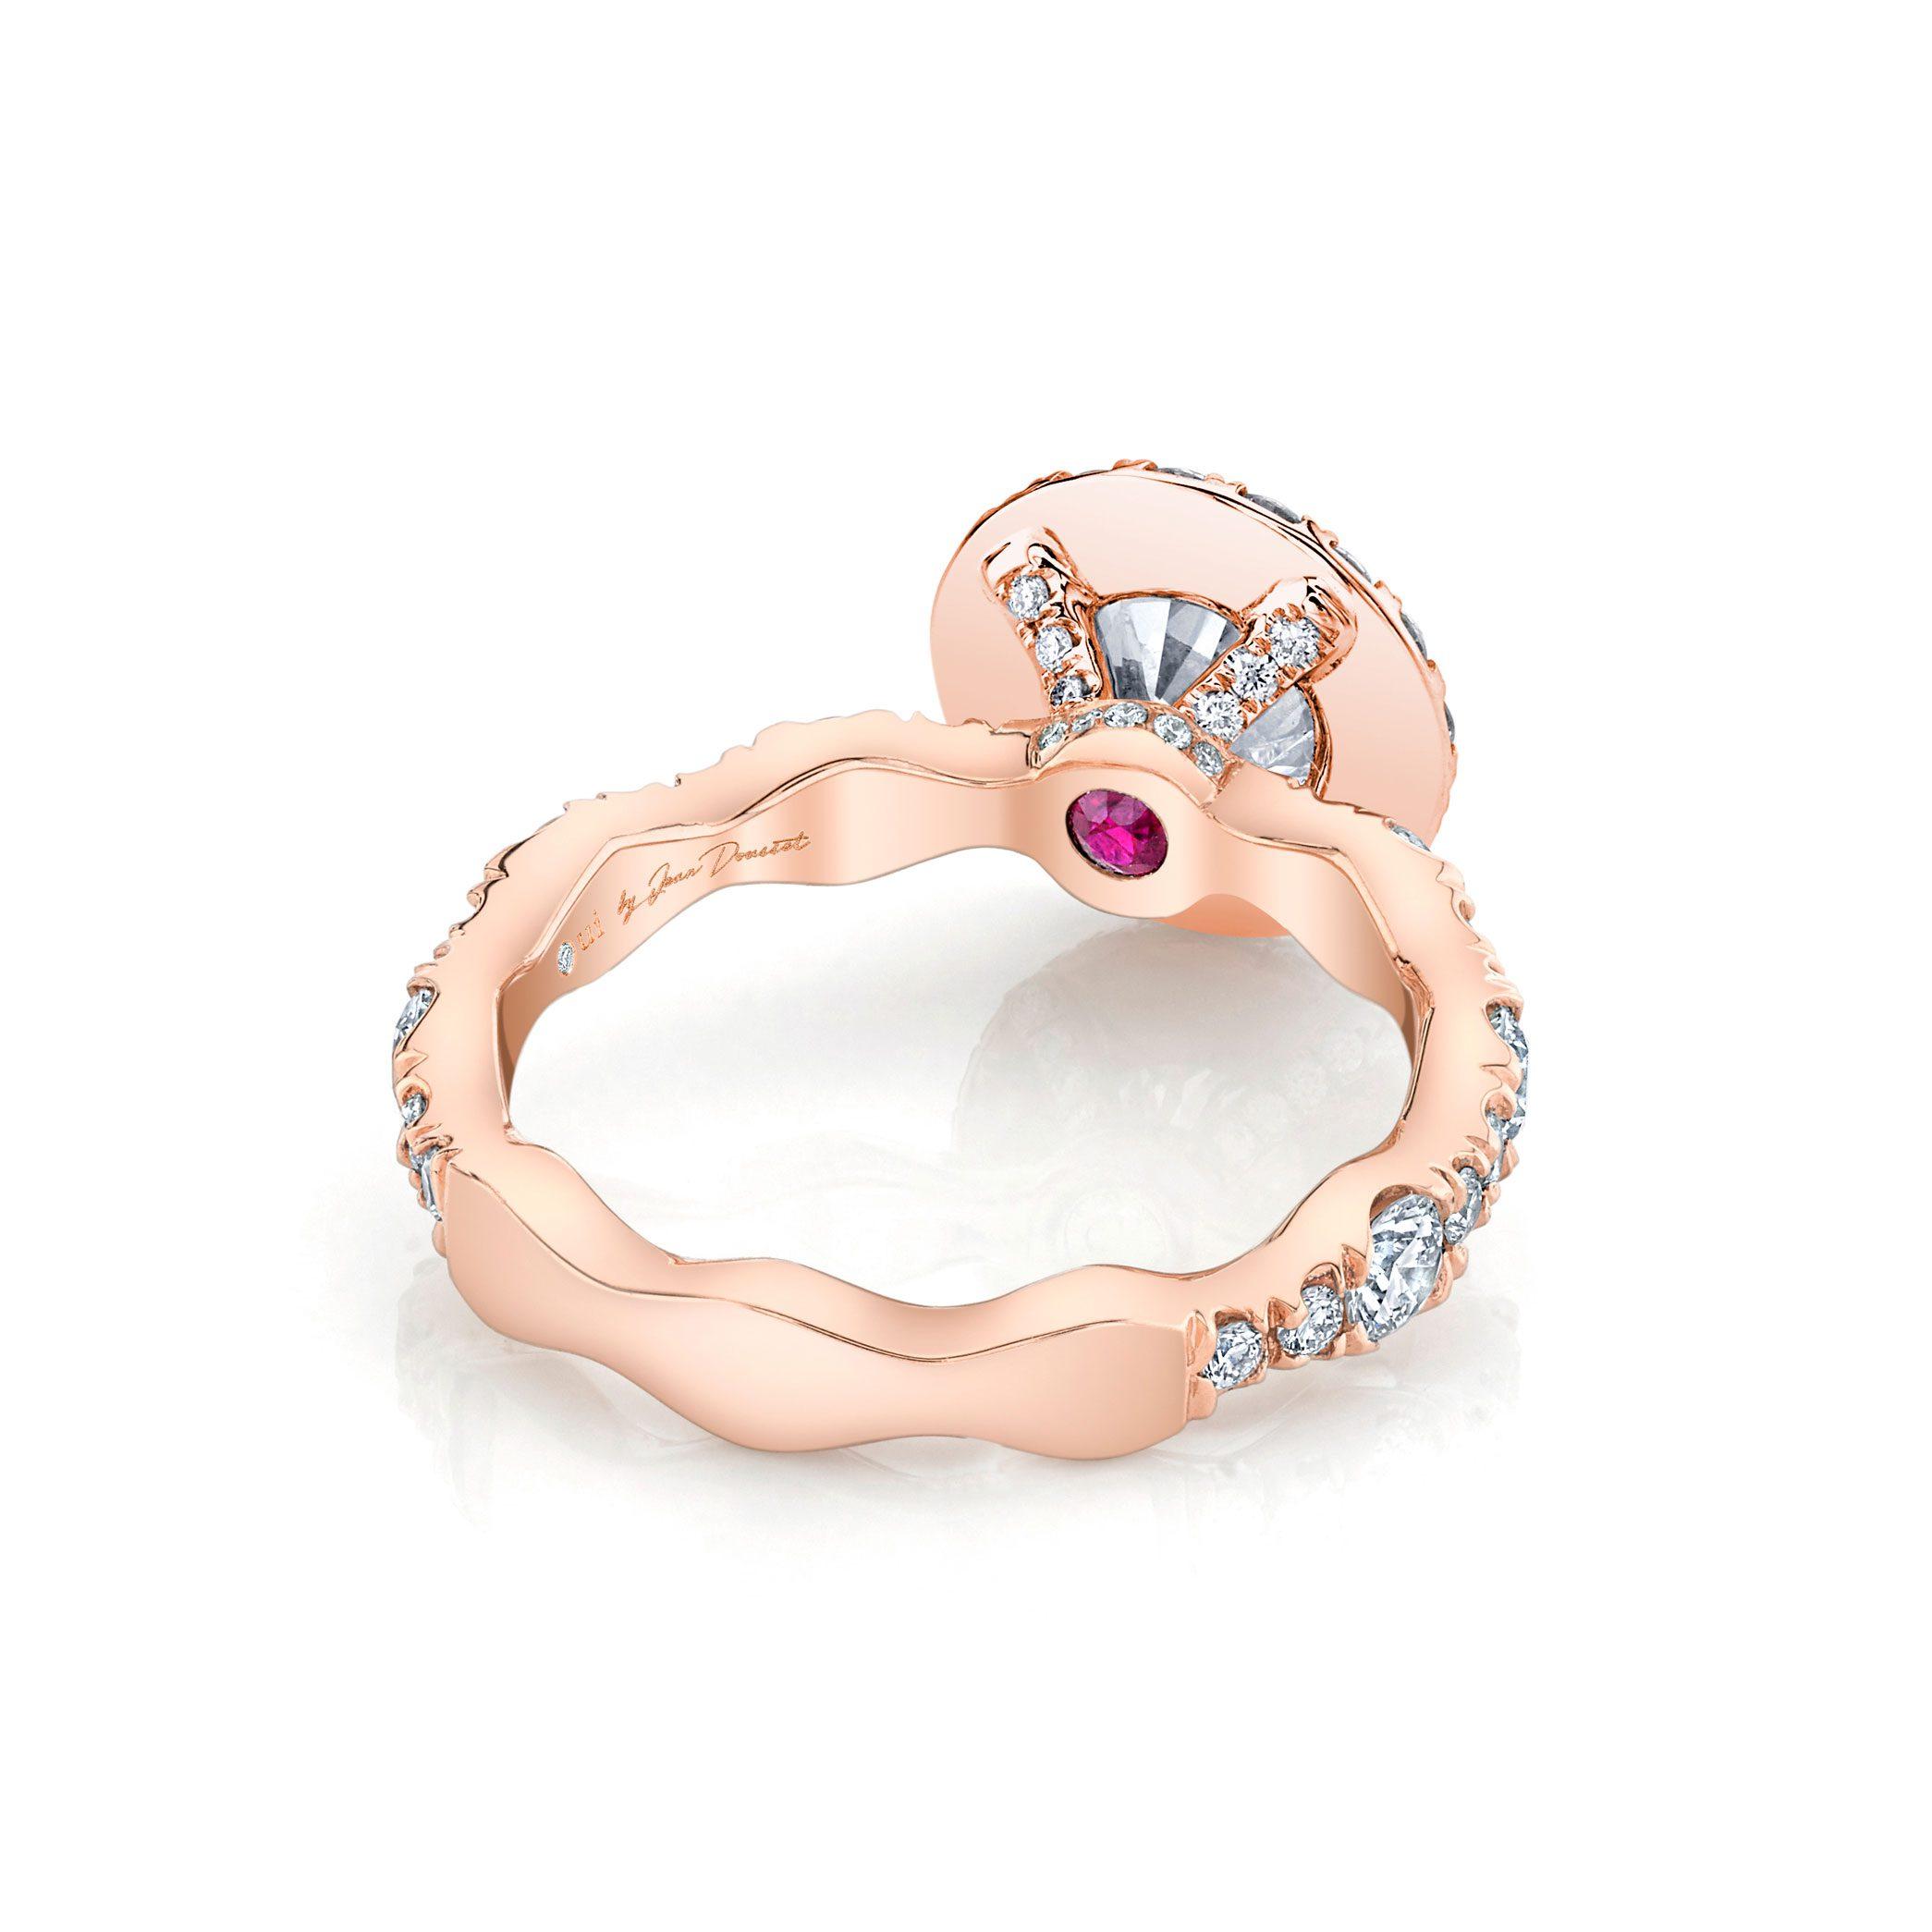 Yvonne Seamless Halo® Round Brilliant Engagement Ring 18k Rose Gold Back Shot